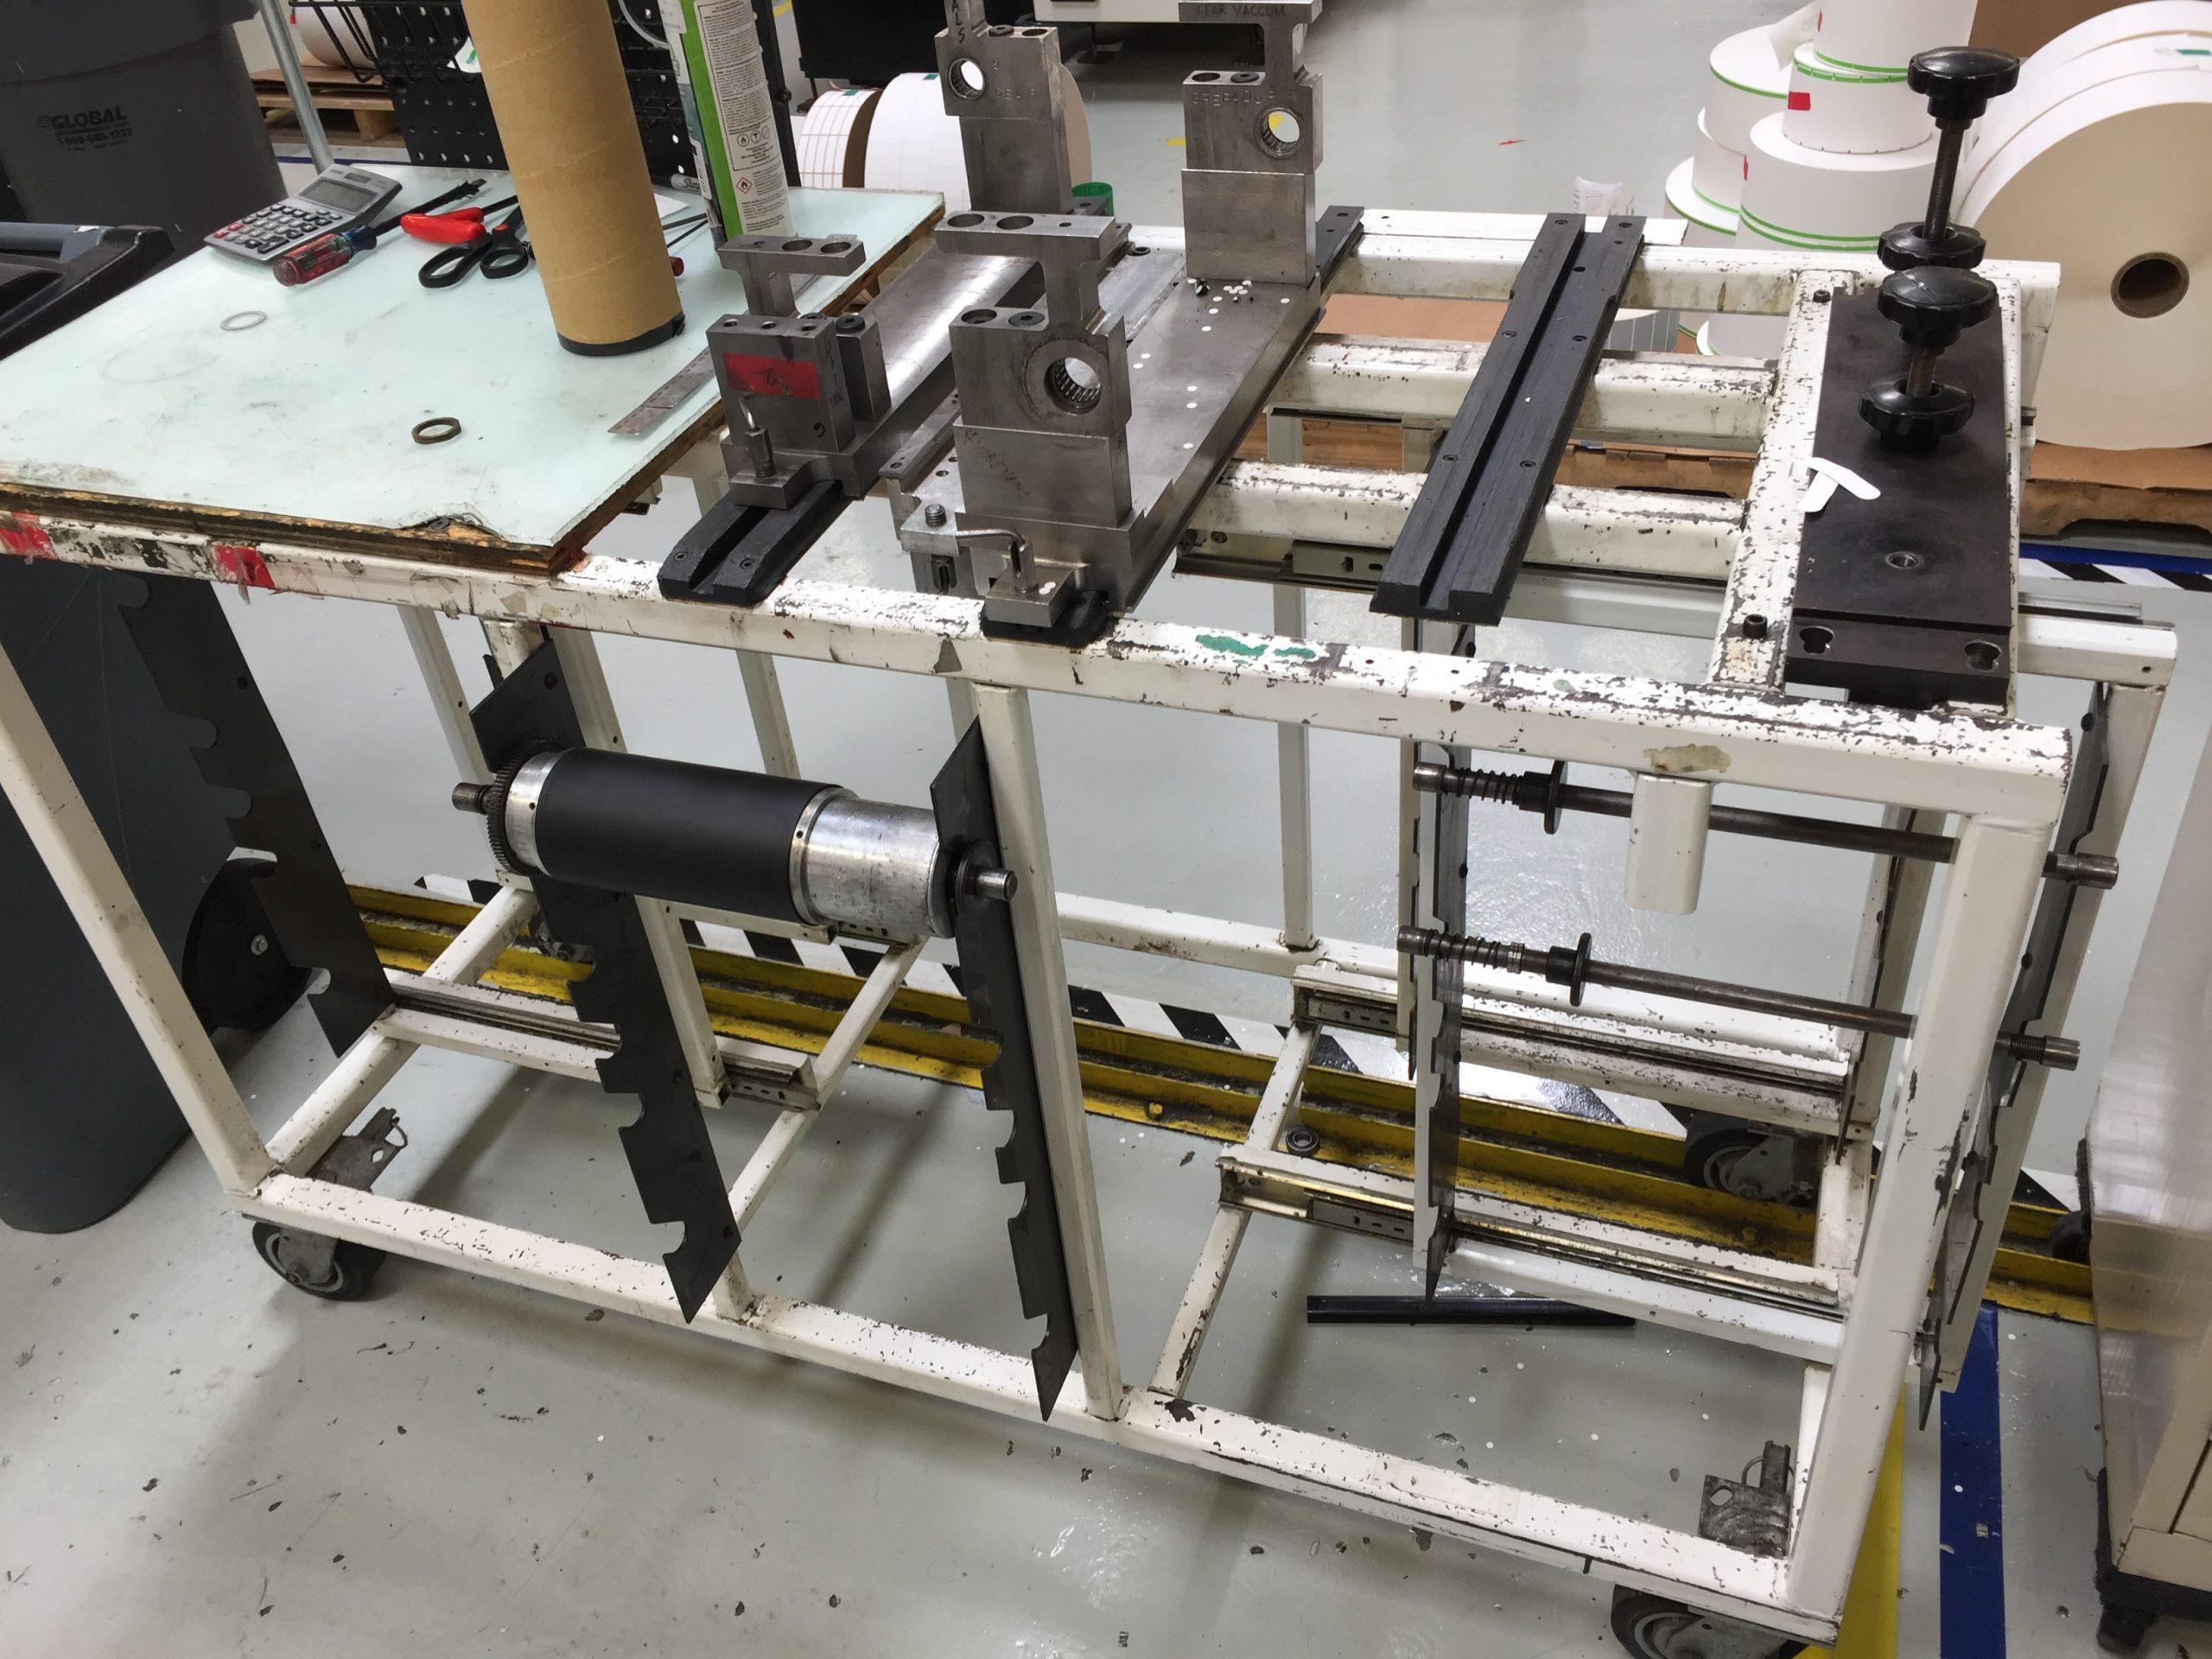 Aquaflex LCQXX-1008 - Used Flexo Printing Presses and Used Flexographic Equipment-10